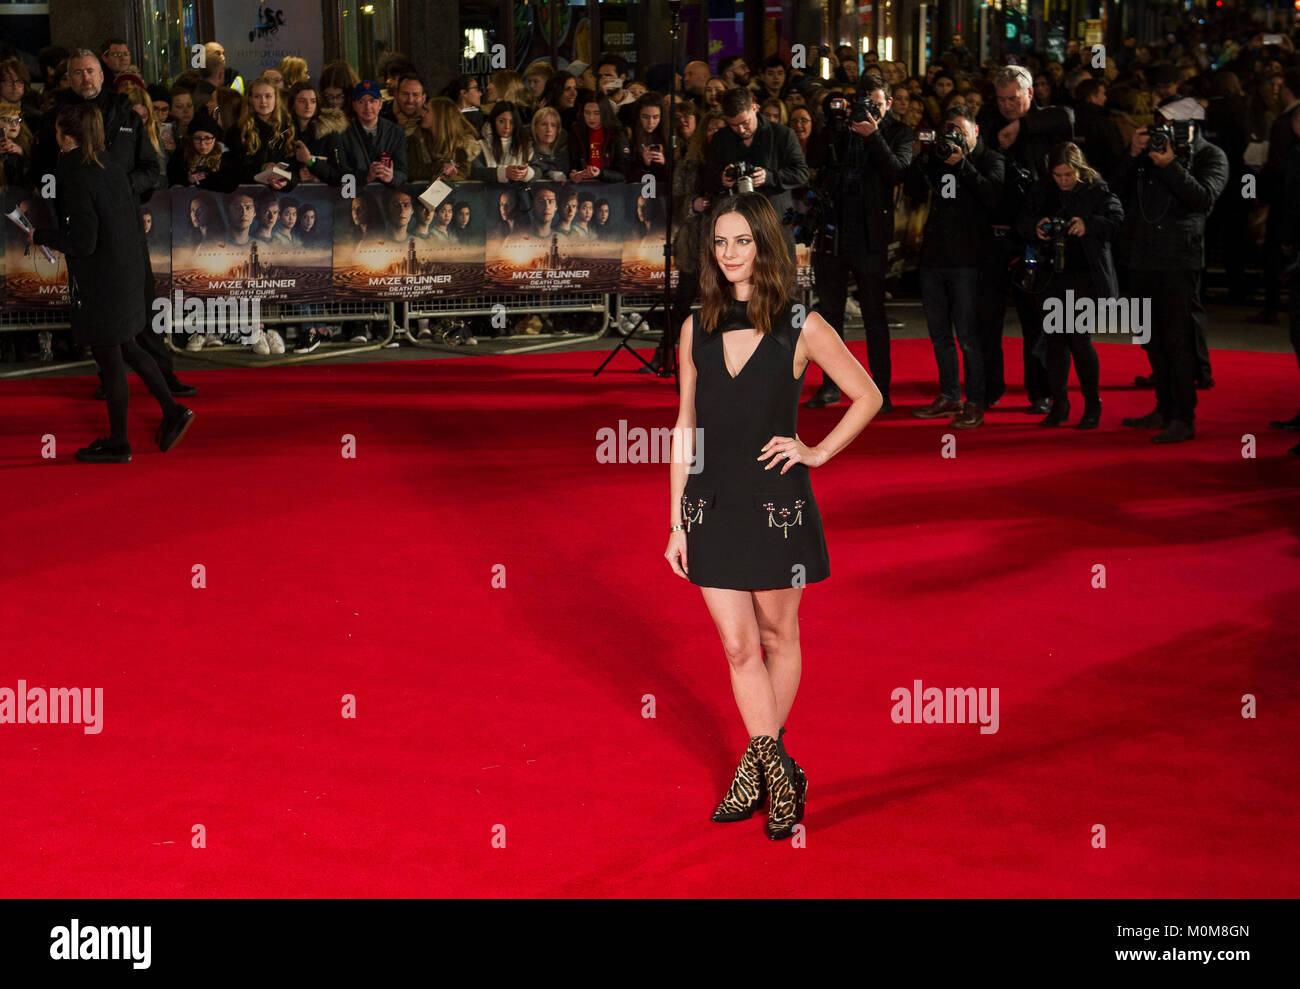 London, UK. 22nd Jan, 2018. Kaya Scodelario attends the 'Maze Runner: The Death Cure' film premiere, London, - Stock Image